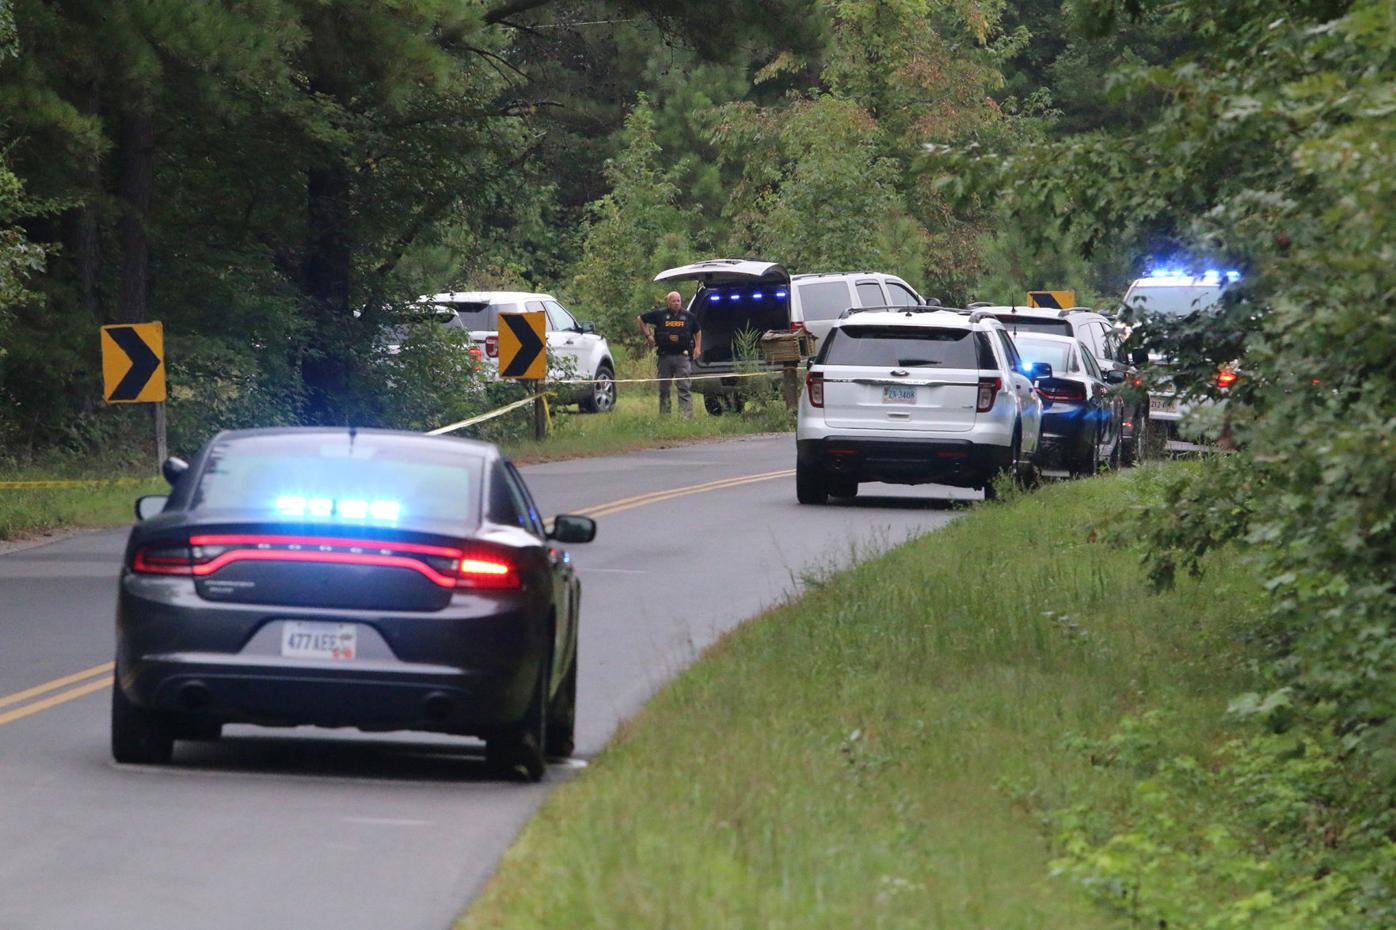 Police Presence on Keeling Drive